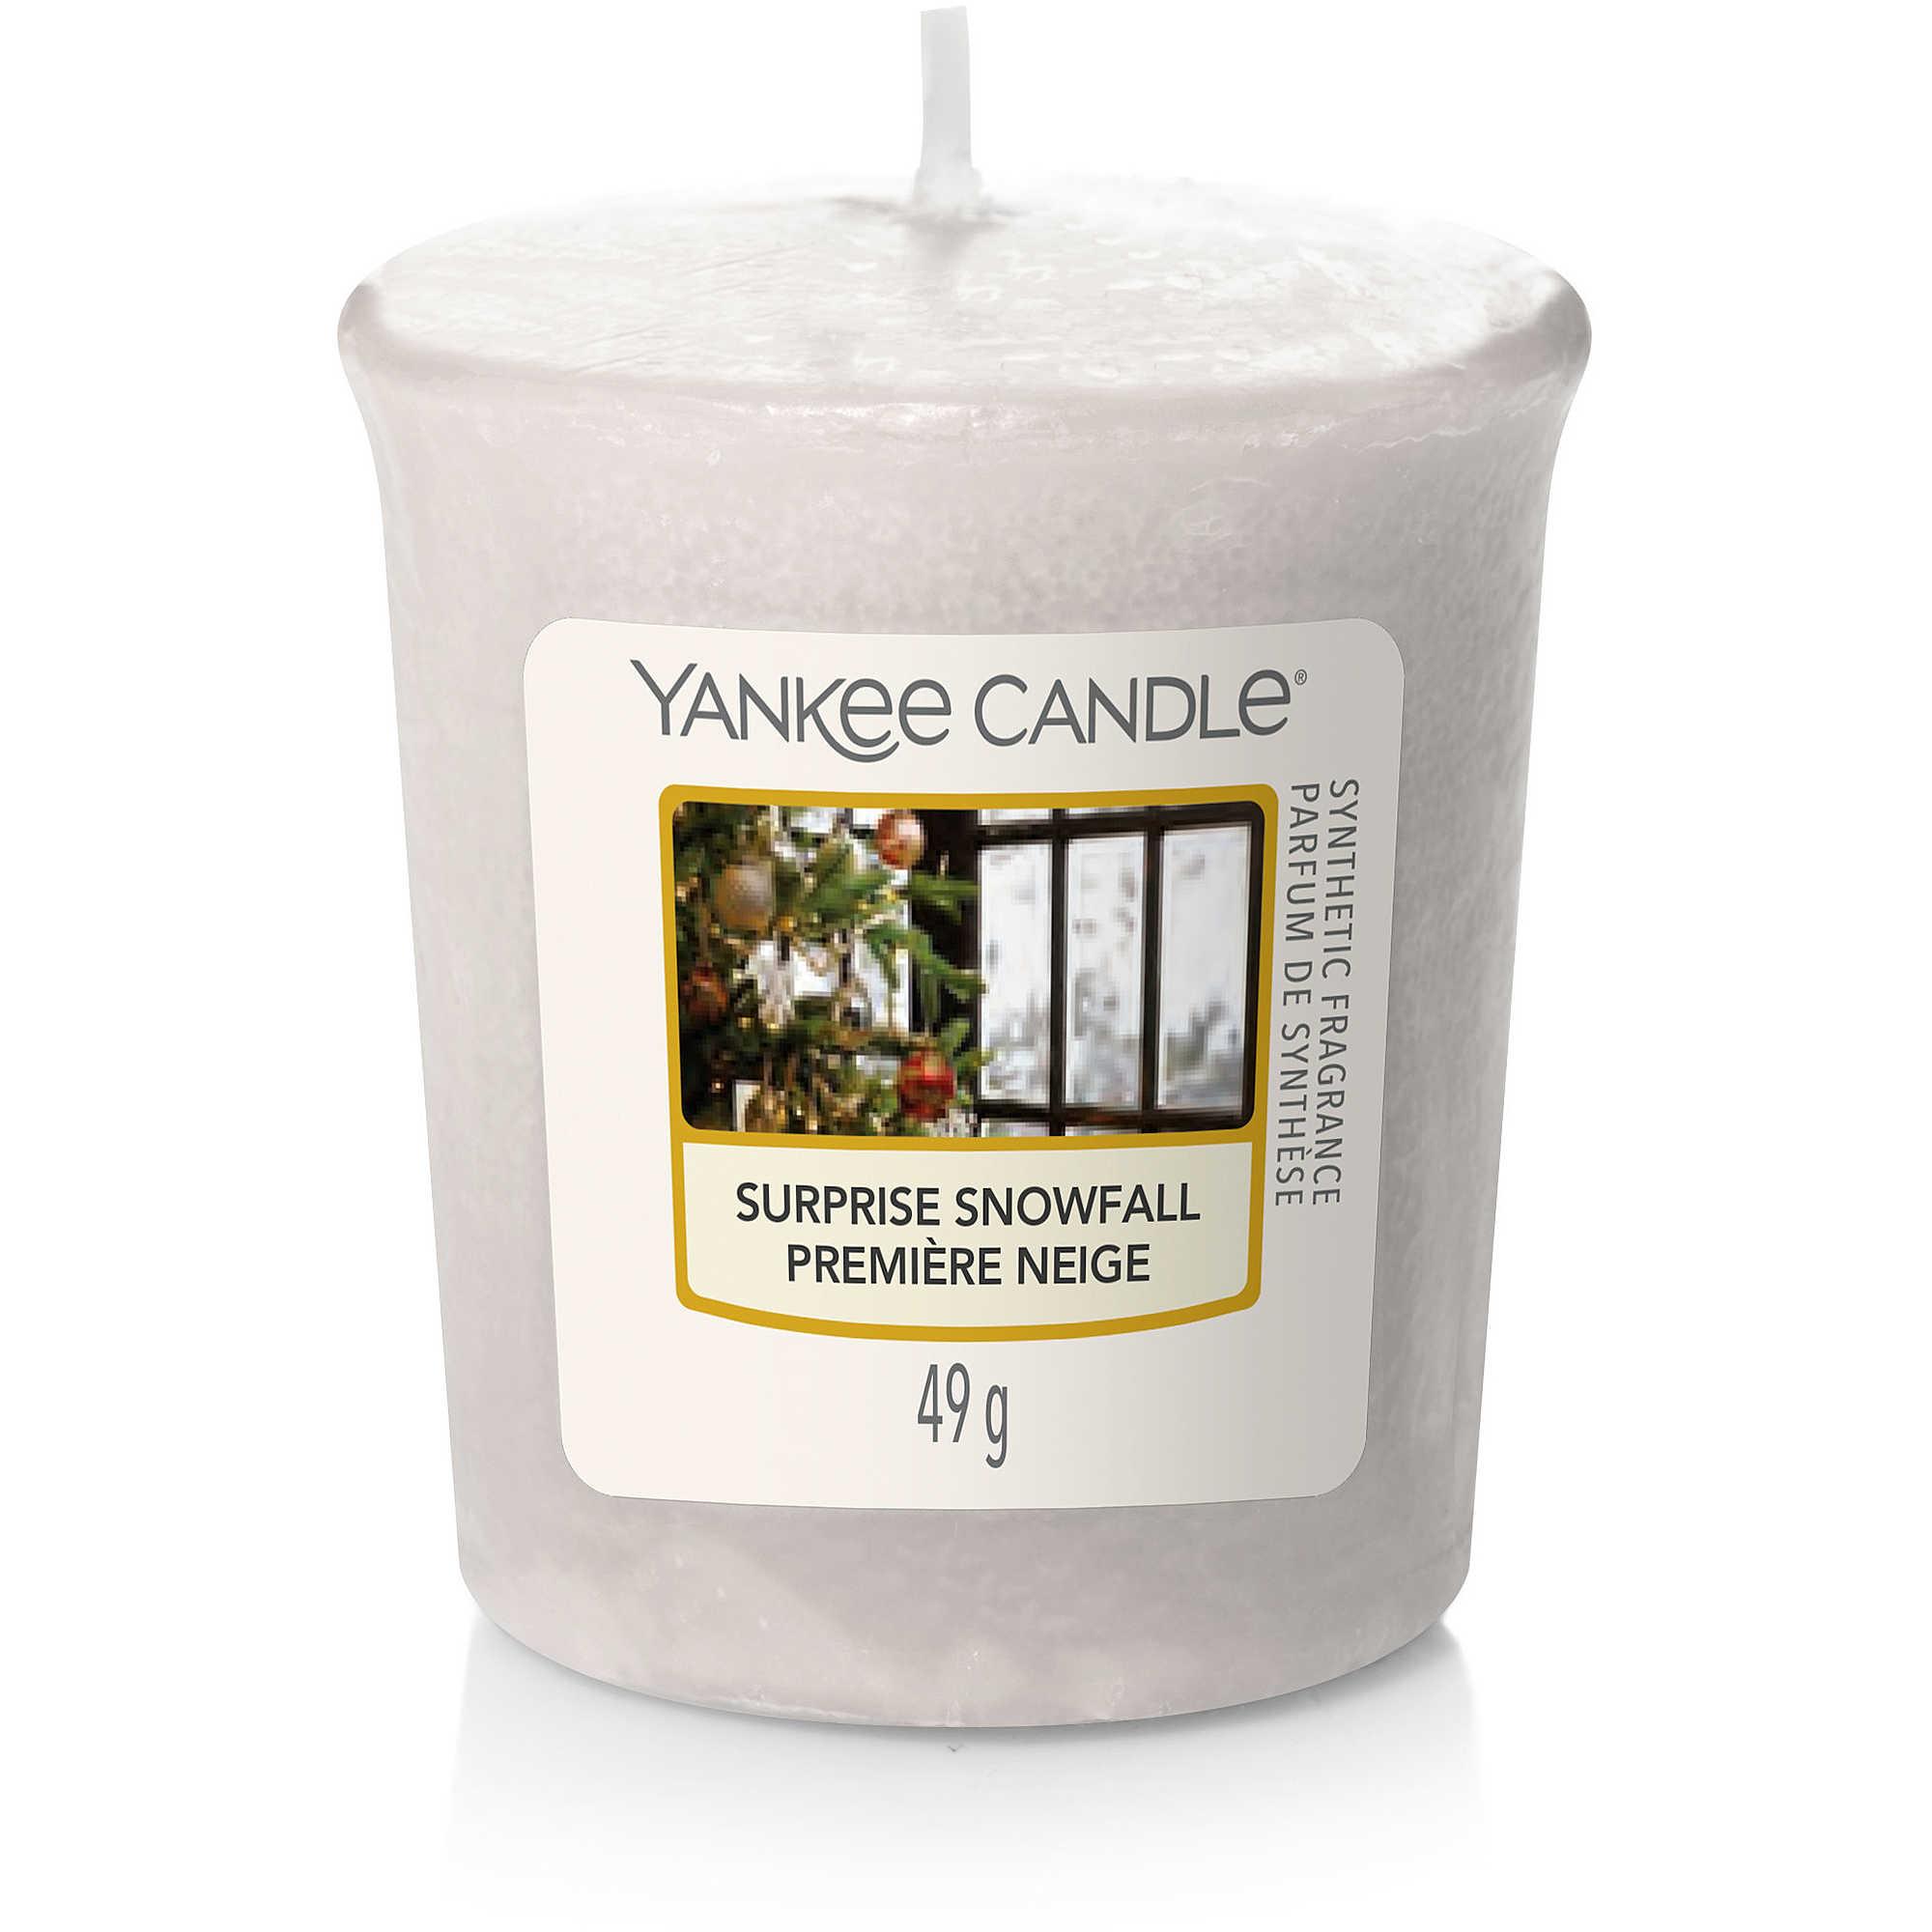 Candela Yankee Candle sampler Surprise Snowfall